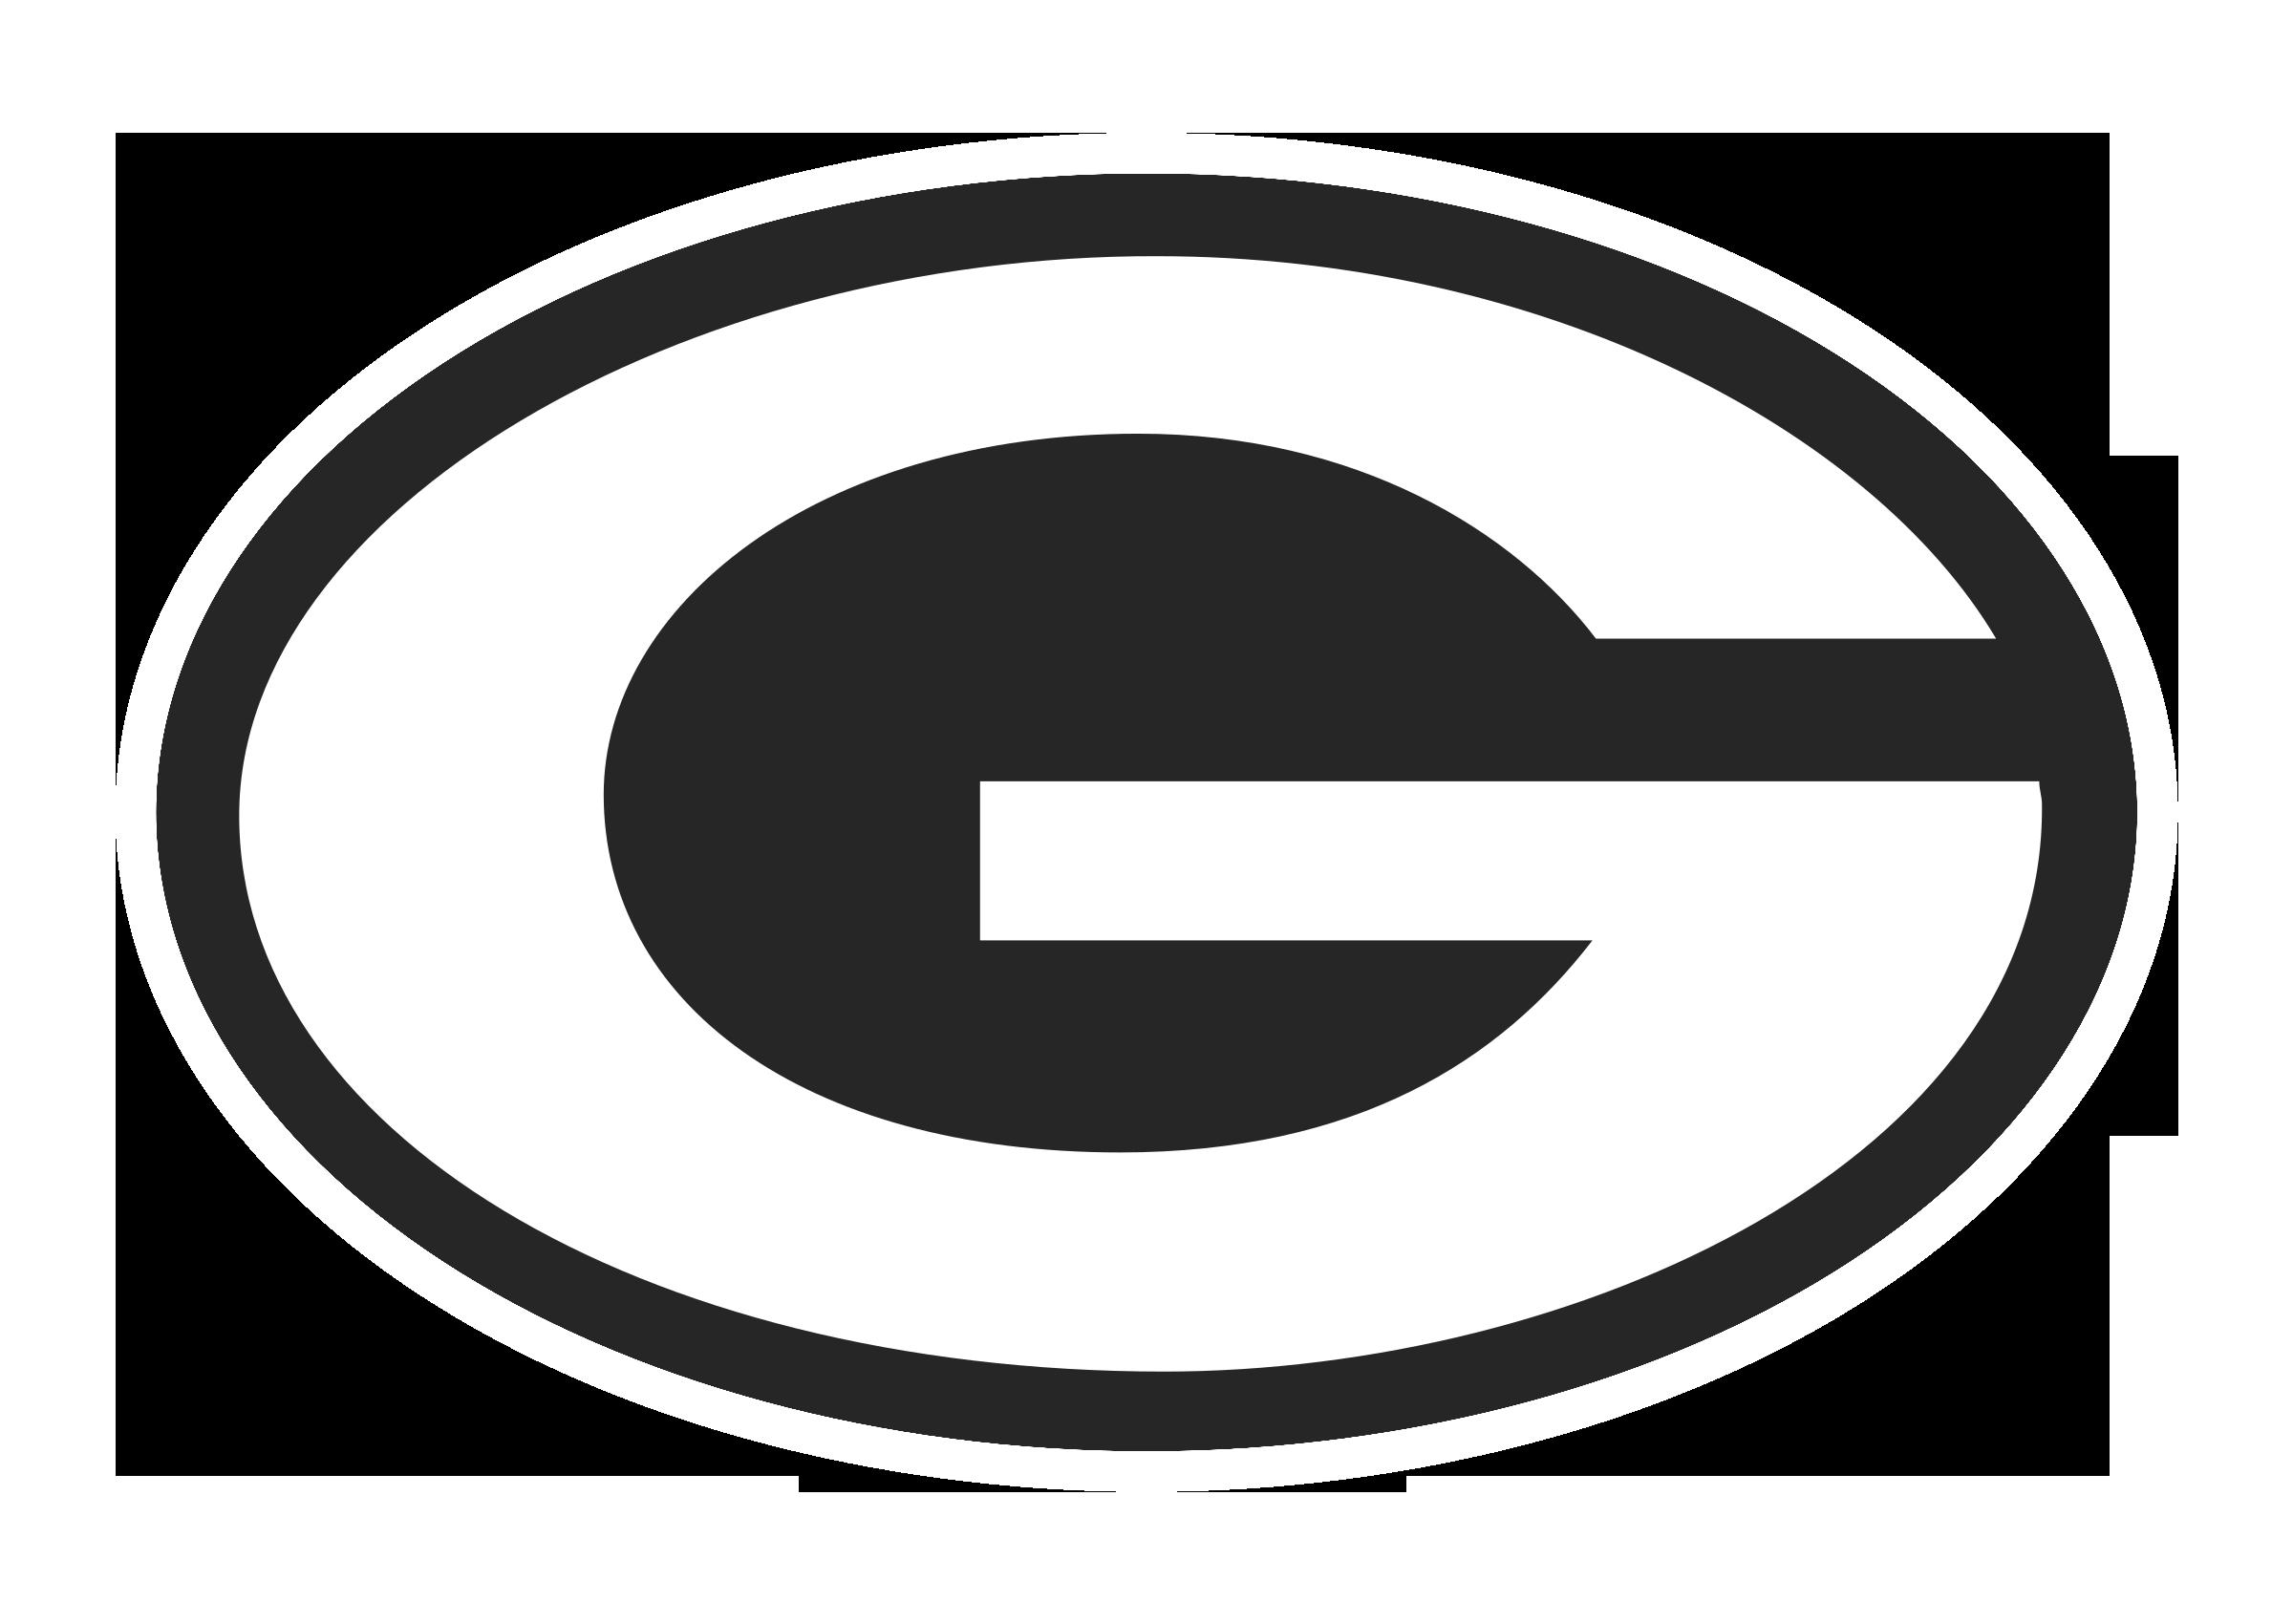 Sports team by logo. Dallas cowboys clipart symbol